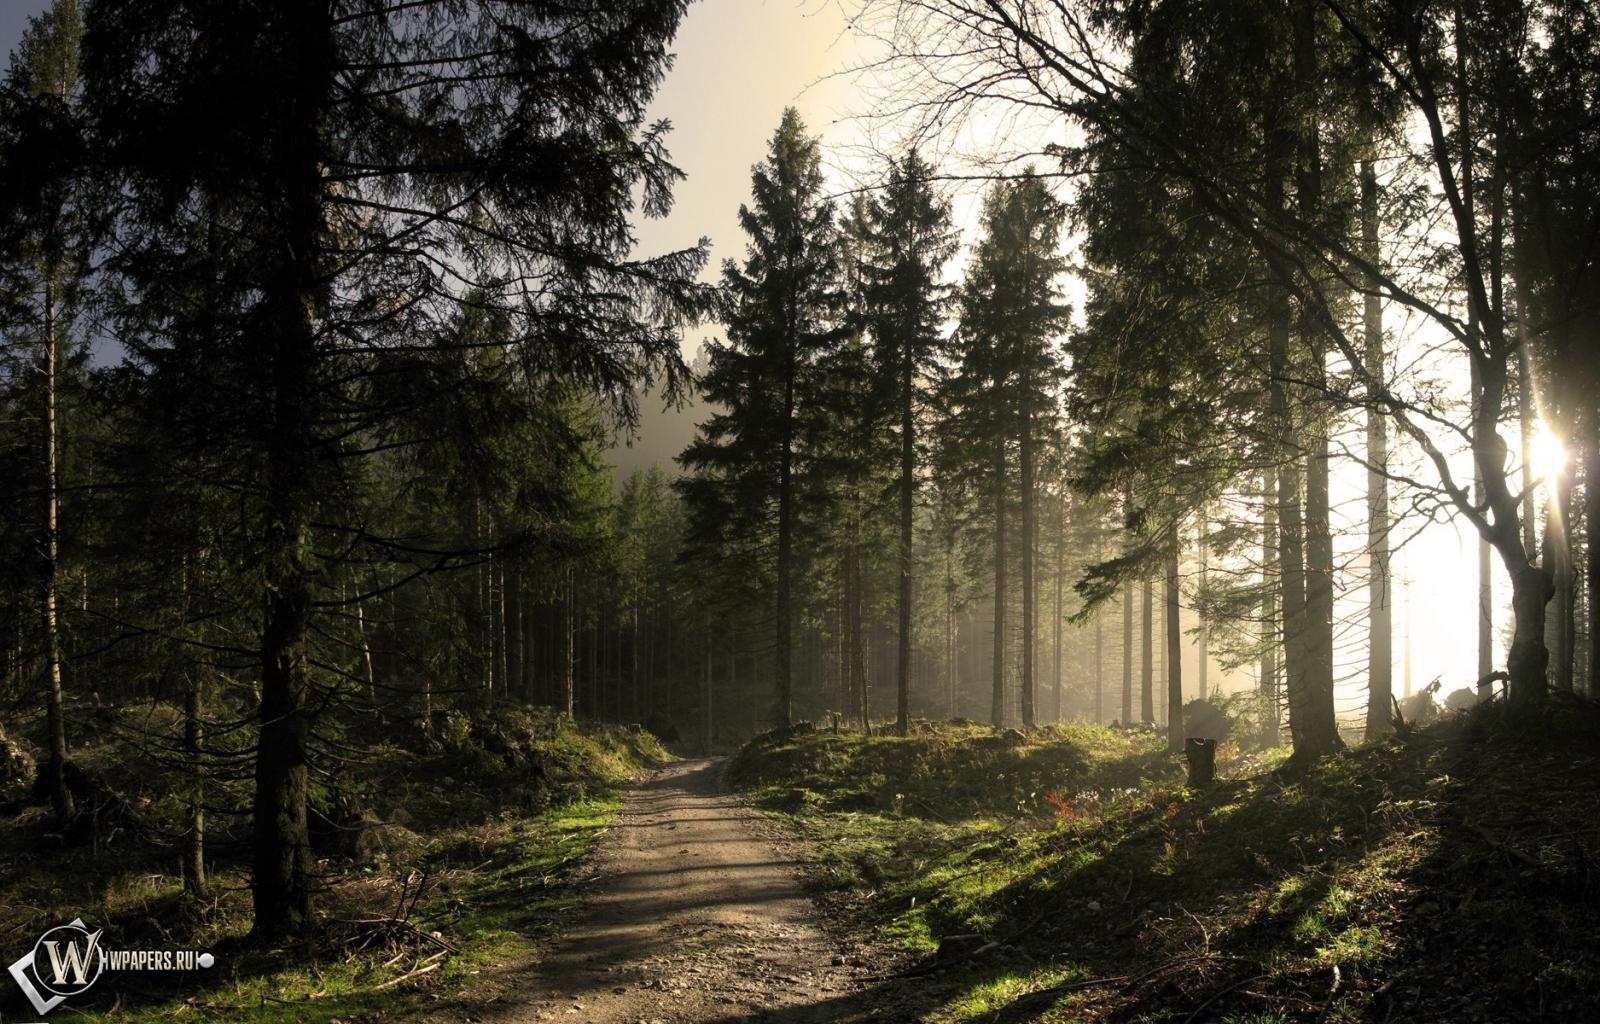 Лес лес обоев 261 солнце обоев 201 тропа